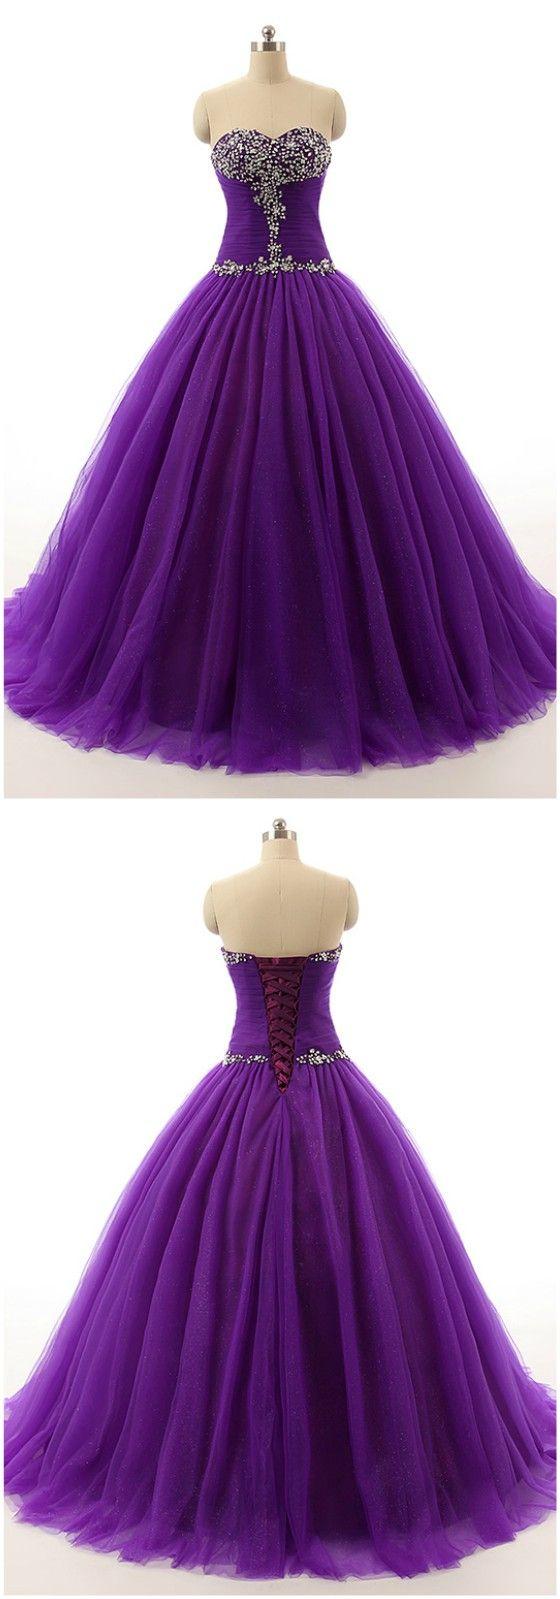 Best 25 purple wedding dresses ideas on pinterest purple purple beaded top sweetheart long tulle formal dress ch0035p 175 gemgrace junglespirit Image collections